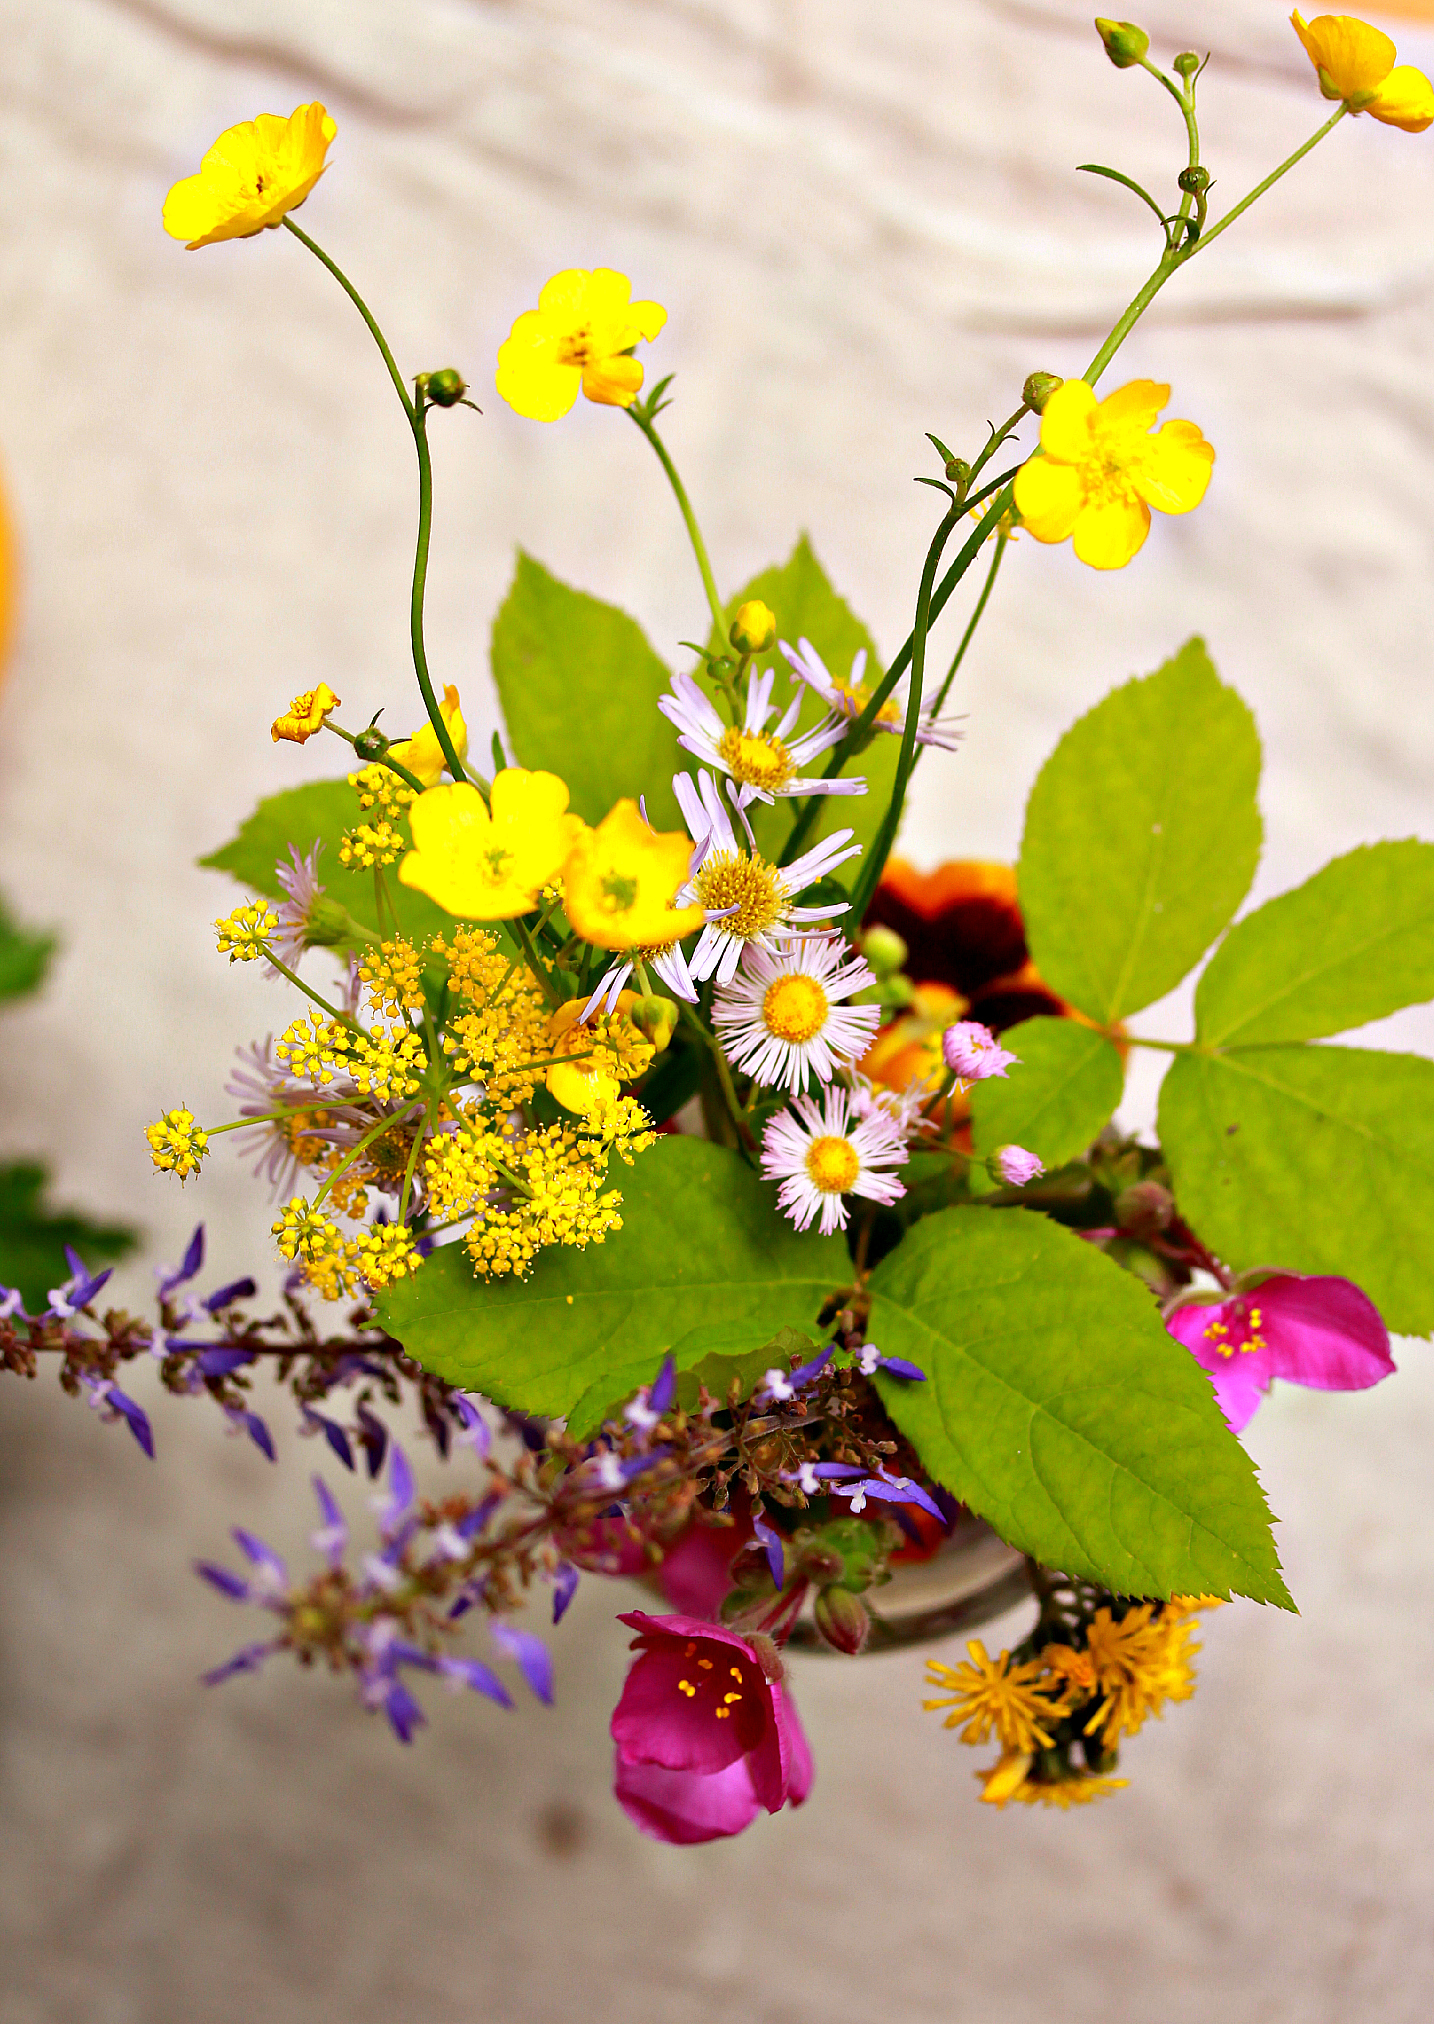 Wildflowers by Dena Testa Bray